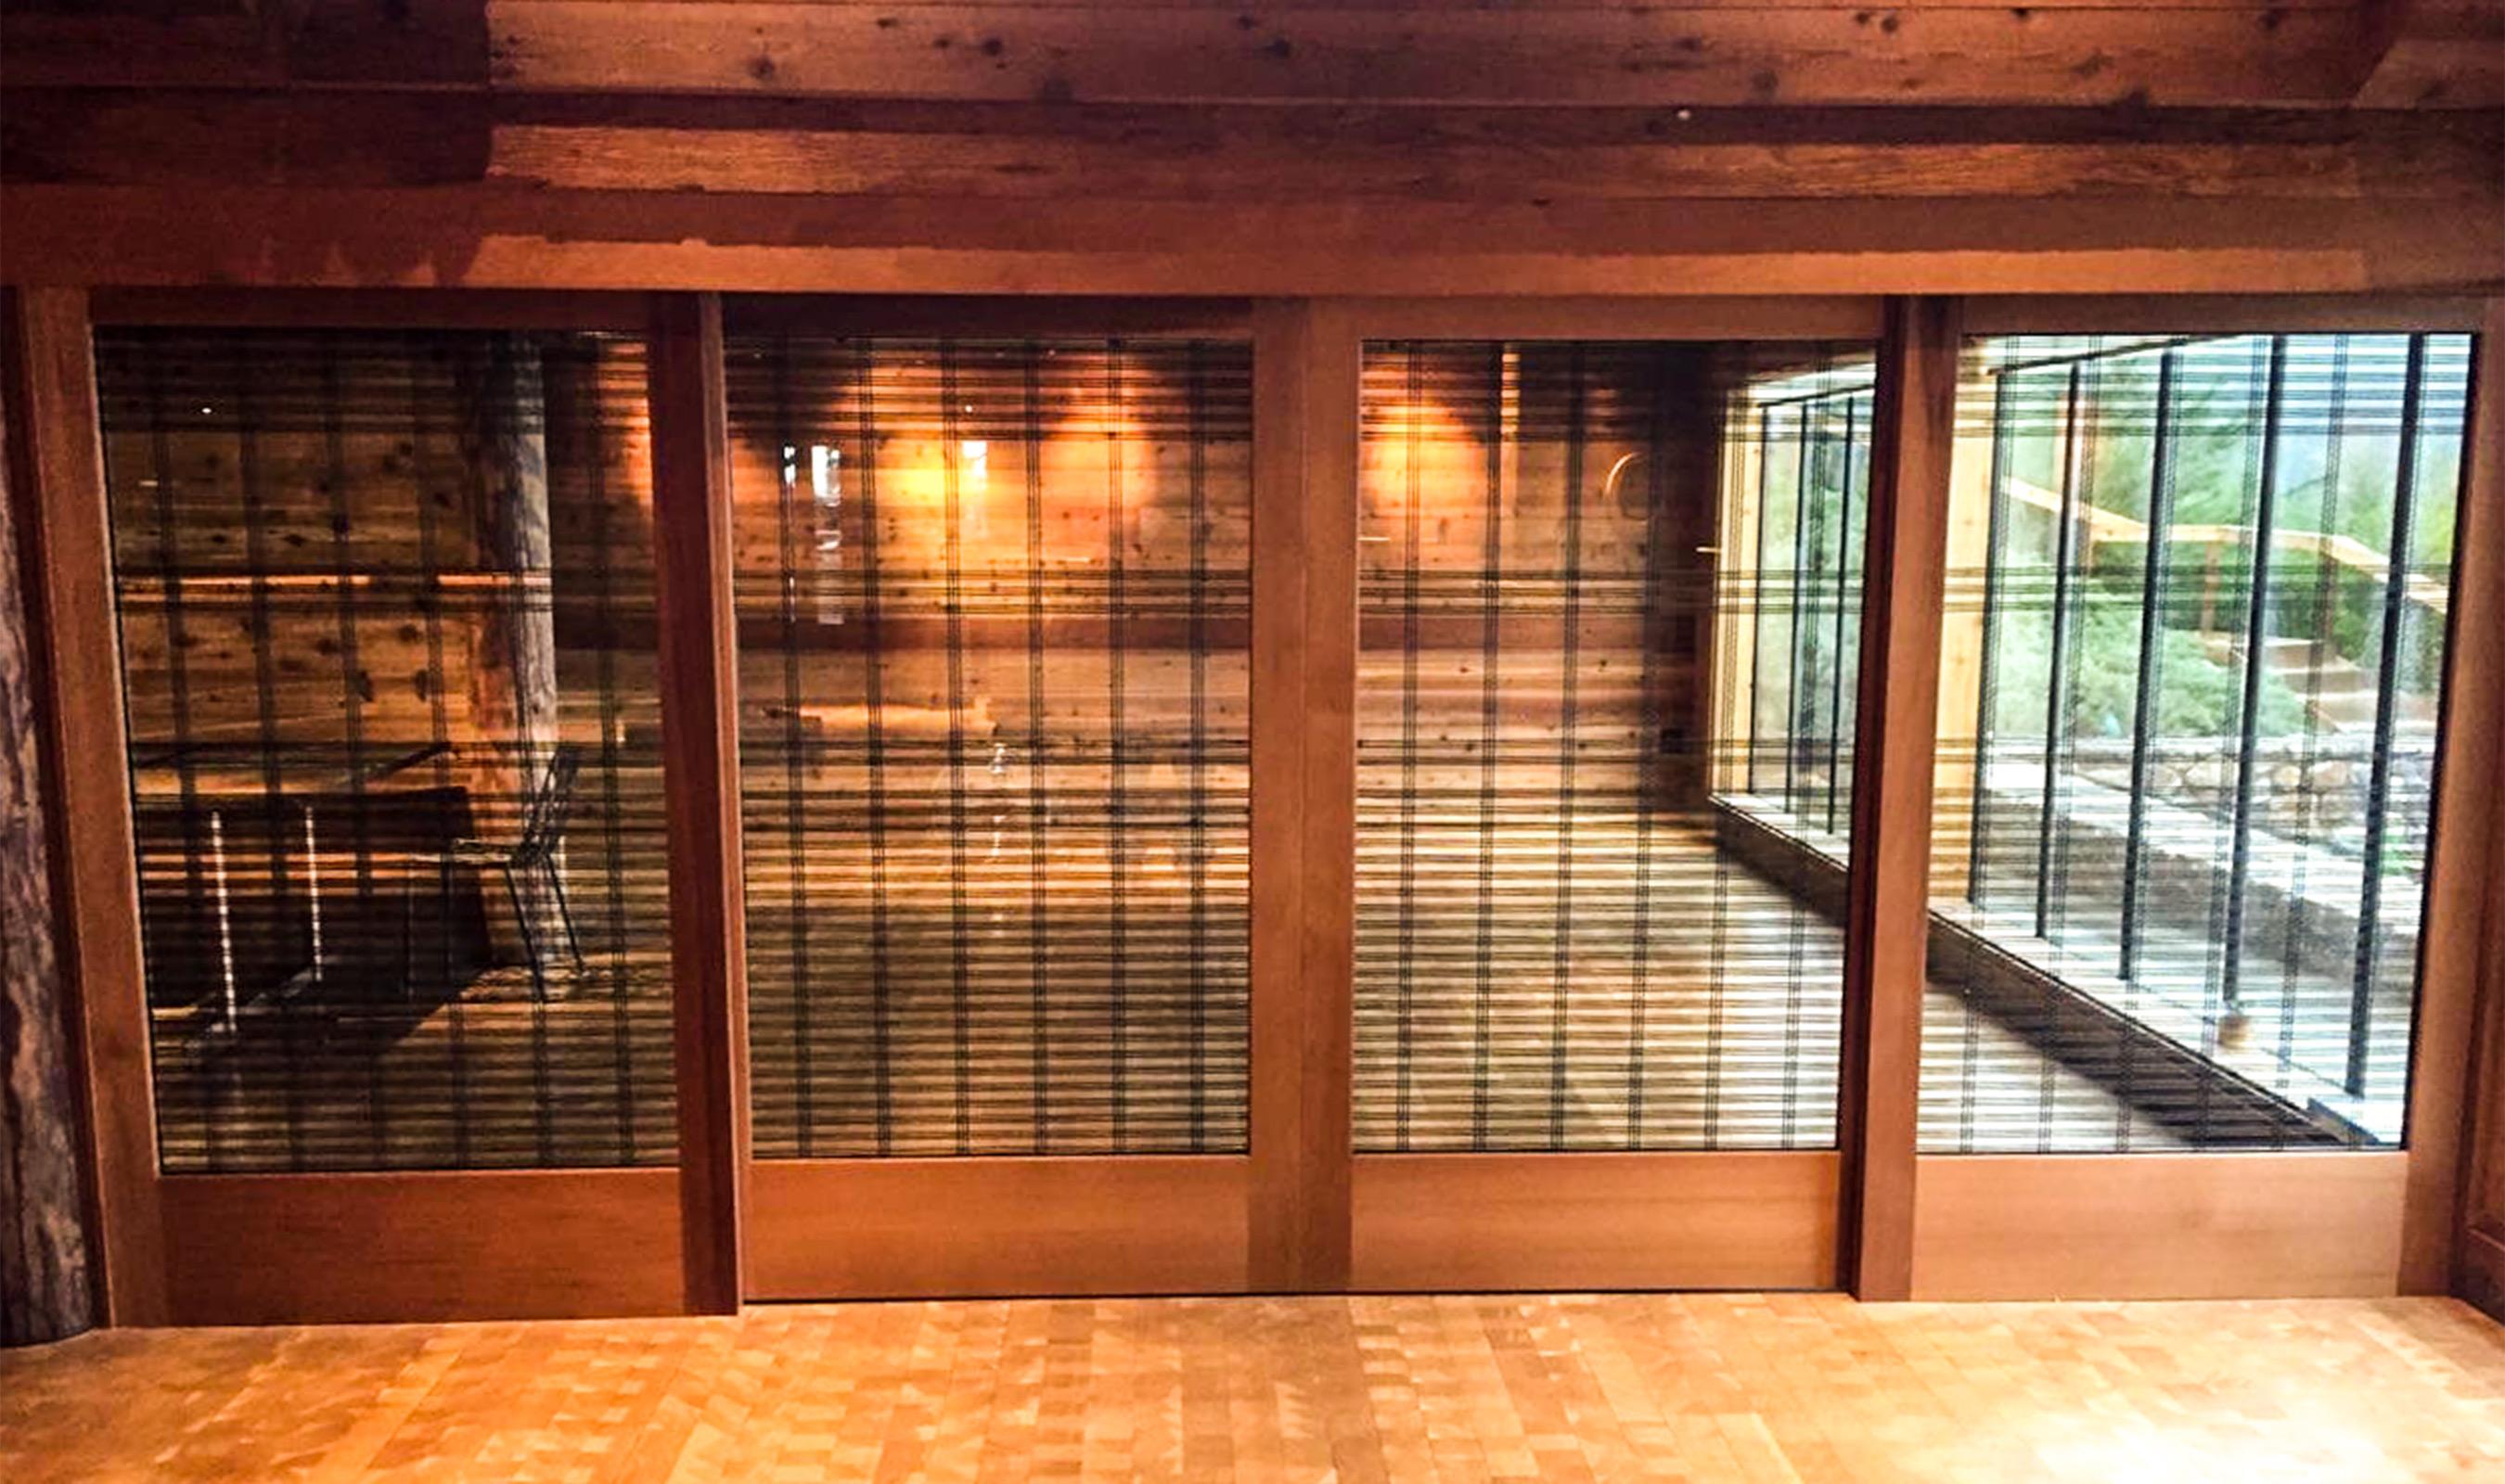 SJD-4 Variable spaced Big Sur restaurant divider screen